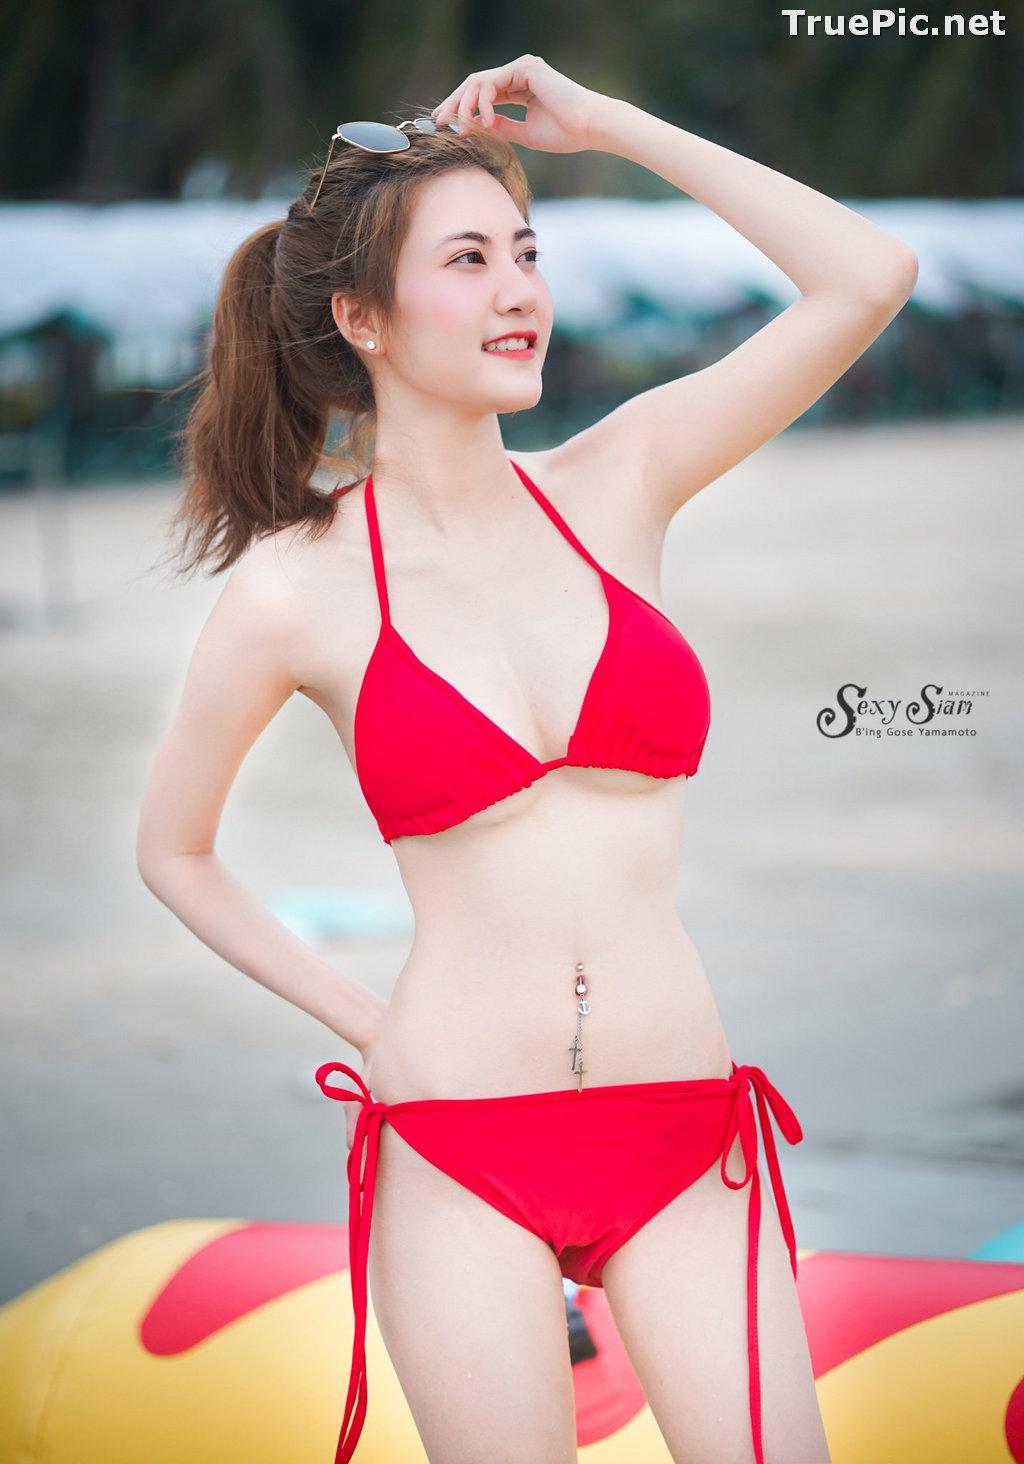 Image Thailand Model - Nitchakan Thongruangkitti - Red Fern Bikini - TruePic.net - Picture-2